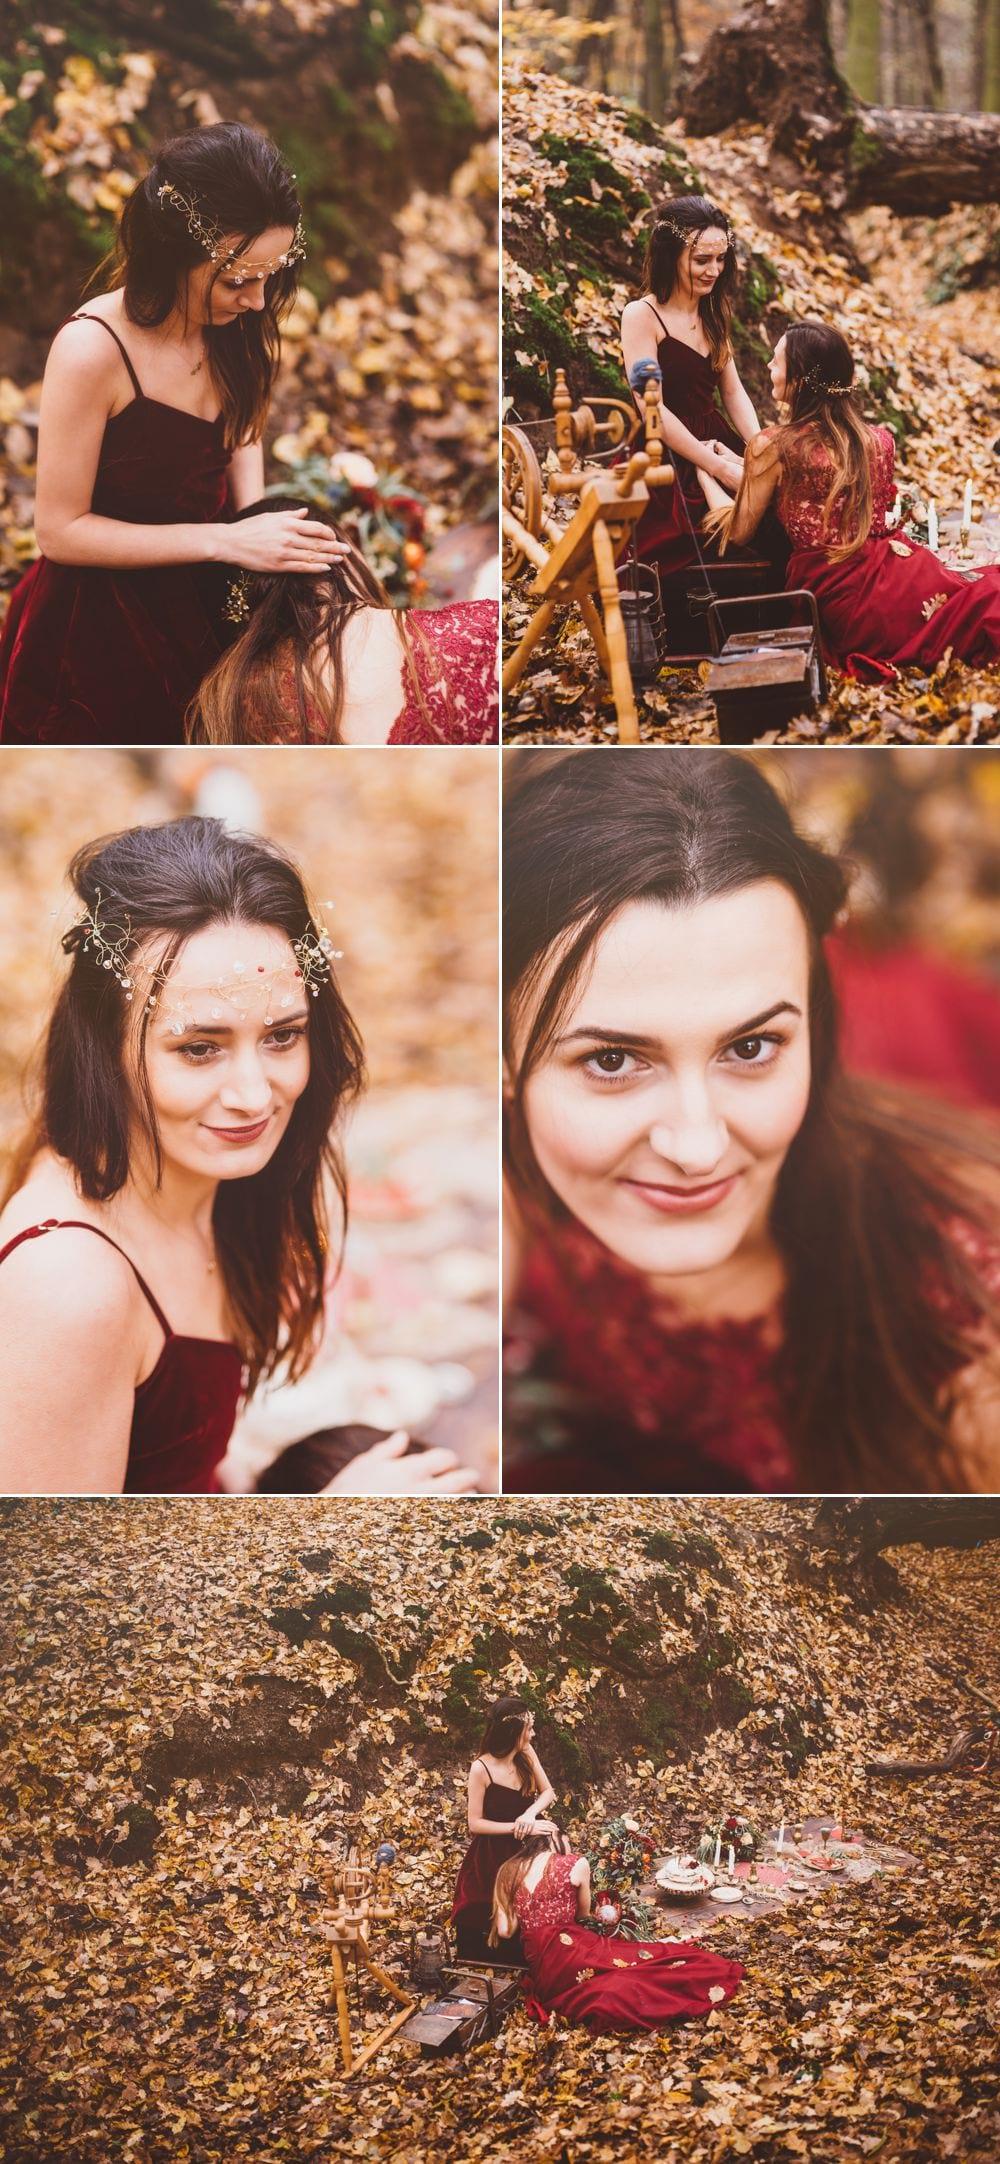 Fotografia Edytorial Marifoto Jesienna sesja pięknych sióstr